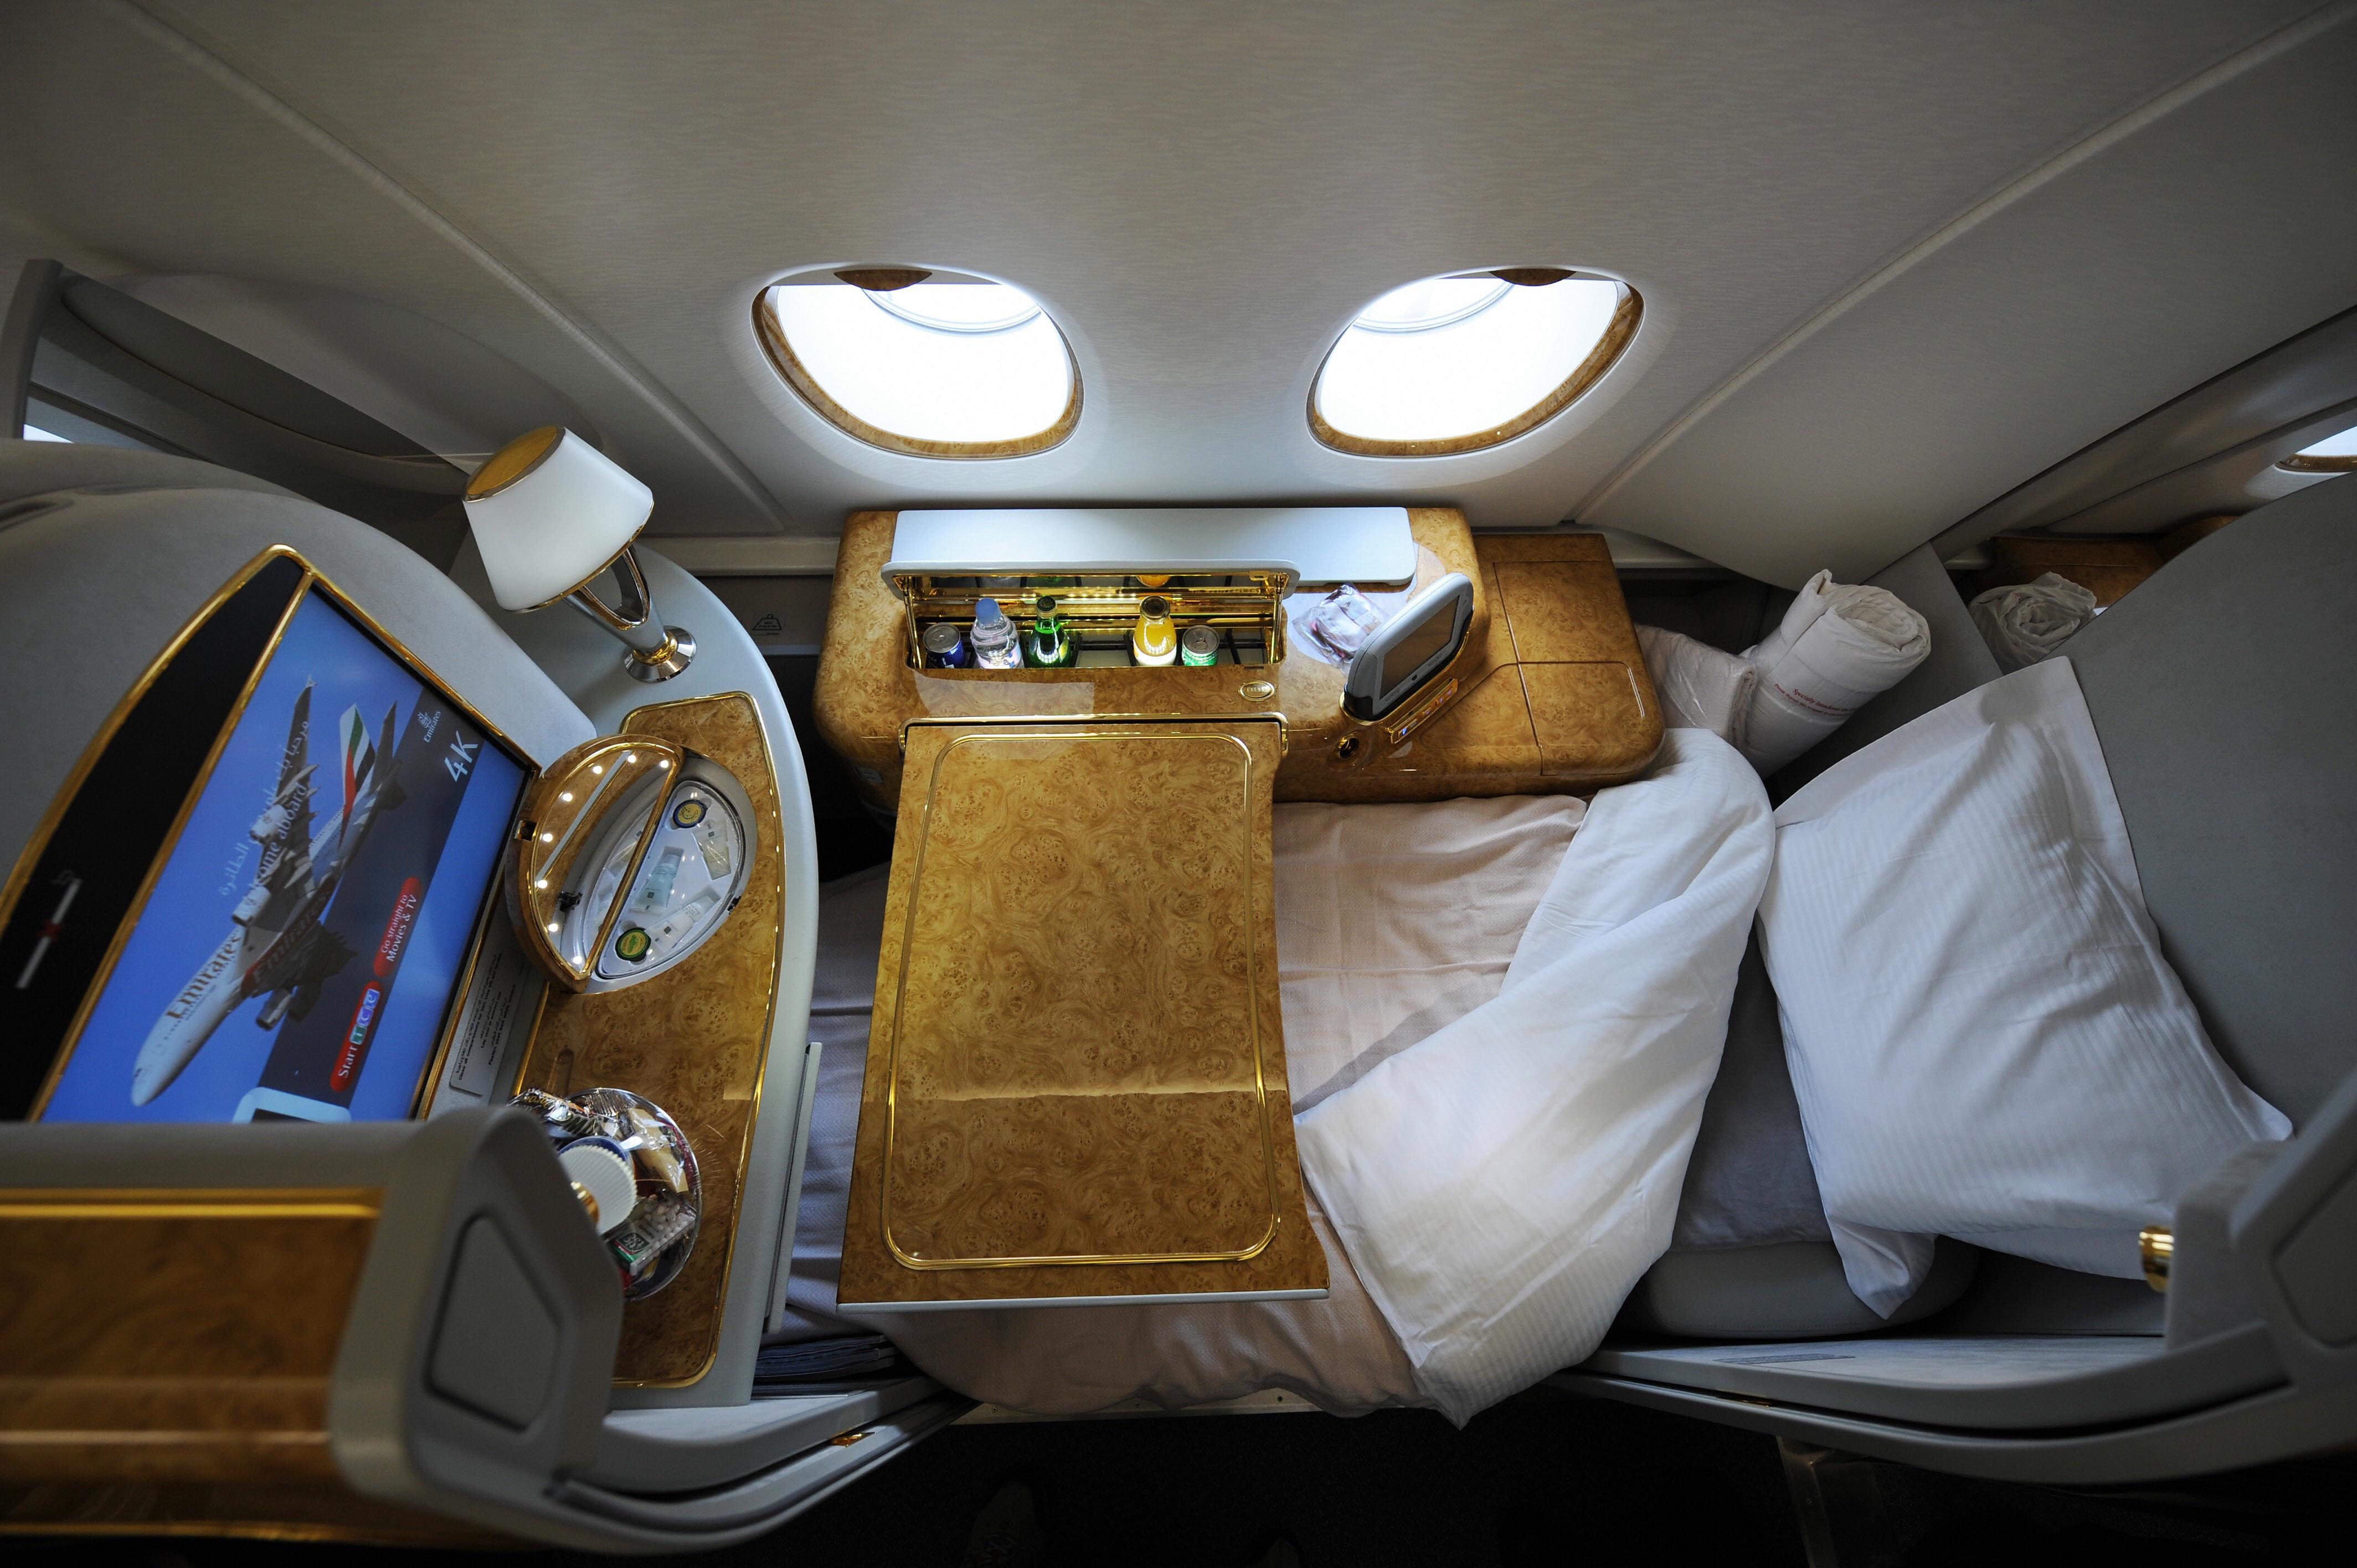 A first class seat configured for sleepi